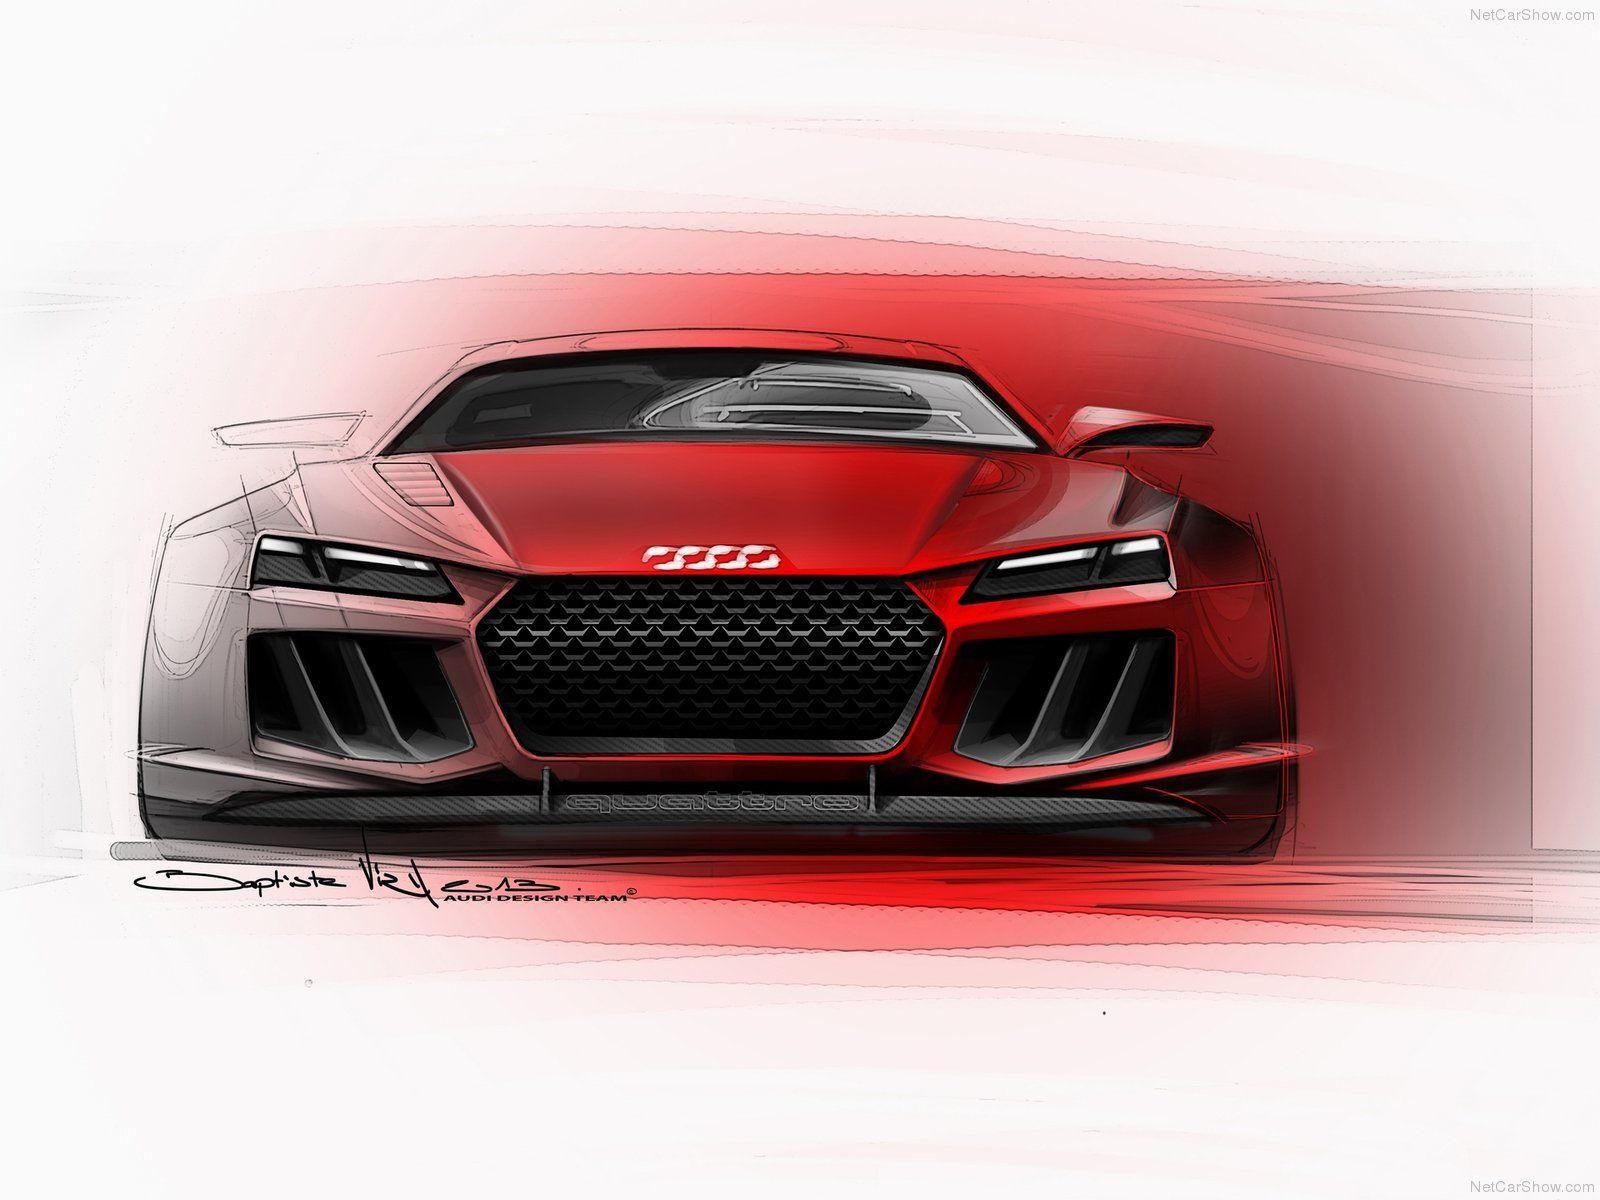 Design Sketch Wallpaper Fresh Audi Sport Quattro Concept - Audi Quattro Sketch , HD Wallpaper & Backgrounds